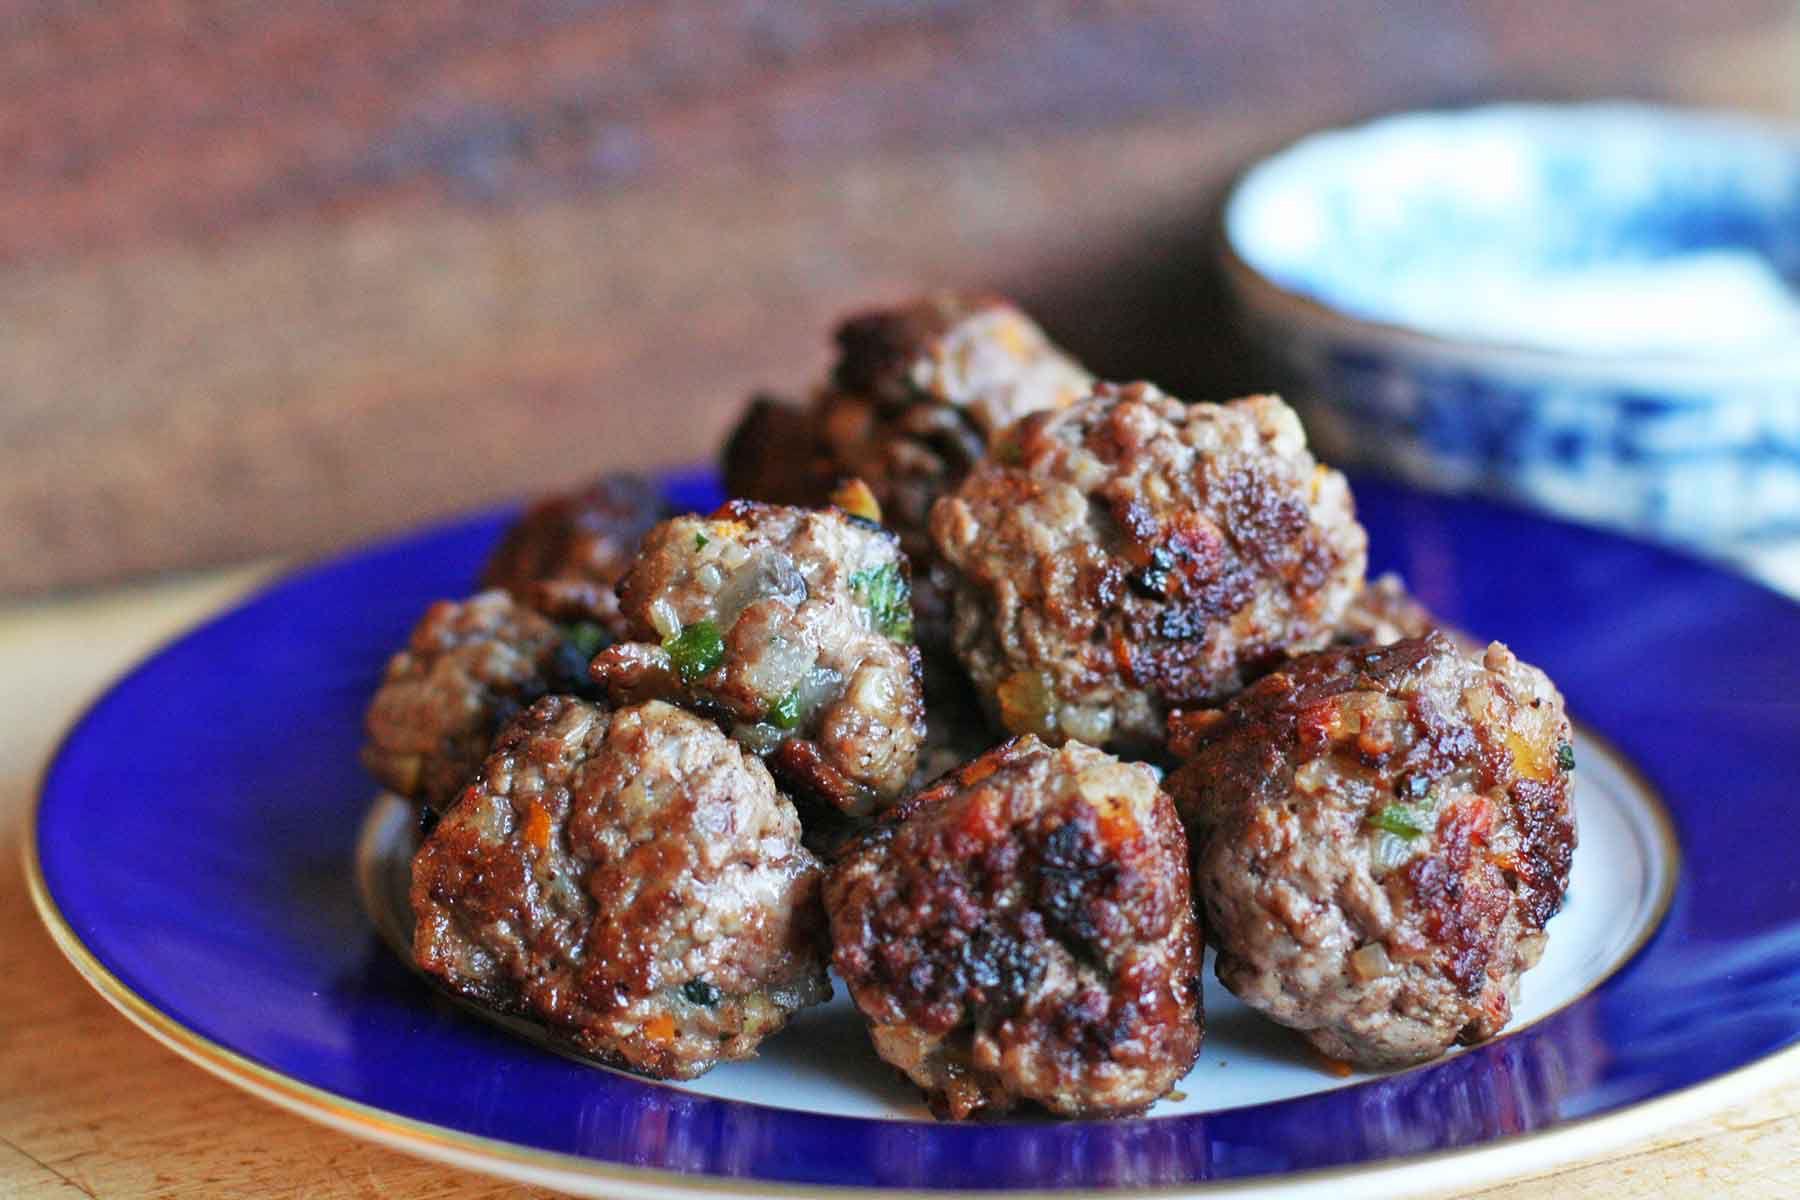 Greek Meatballs on serving plate